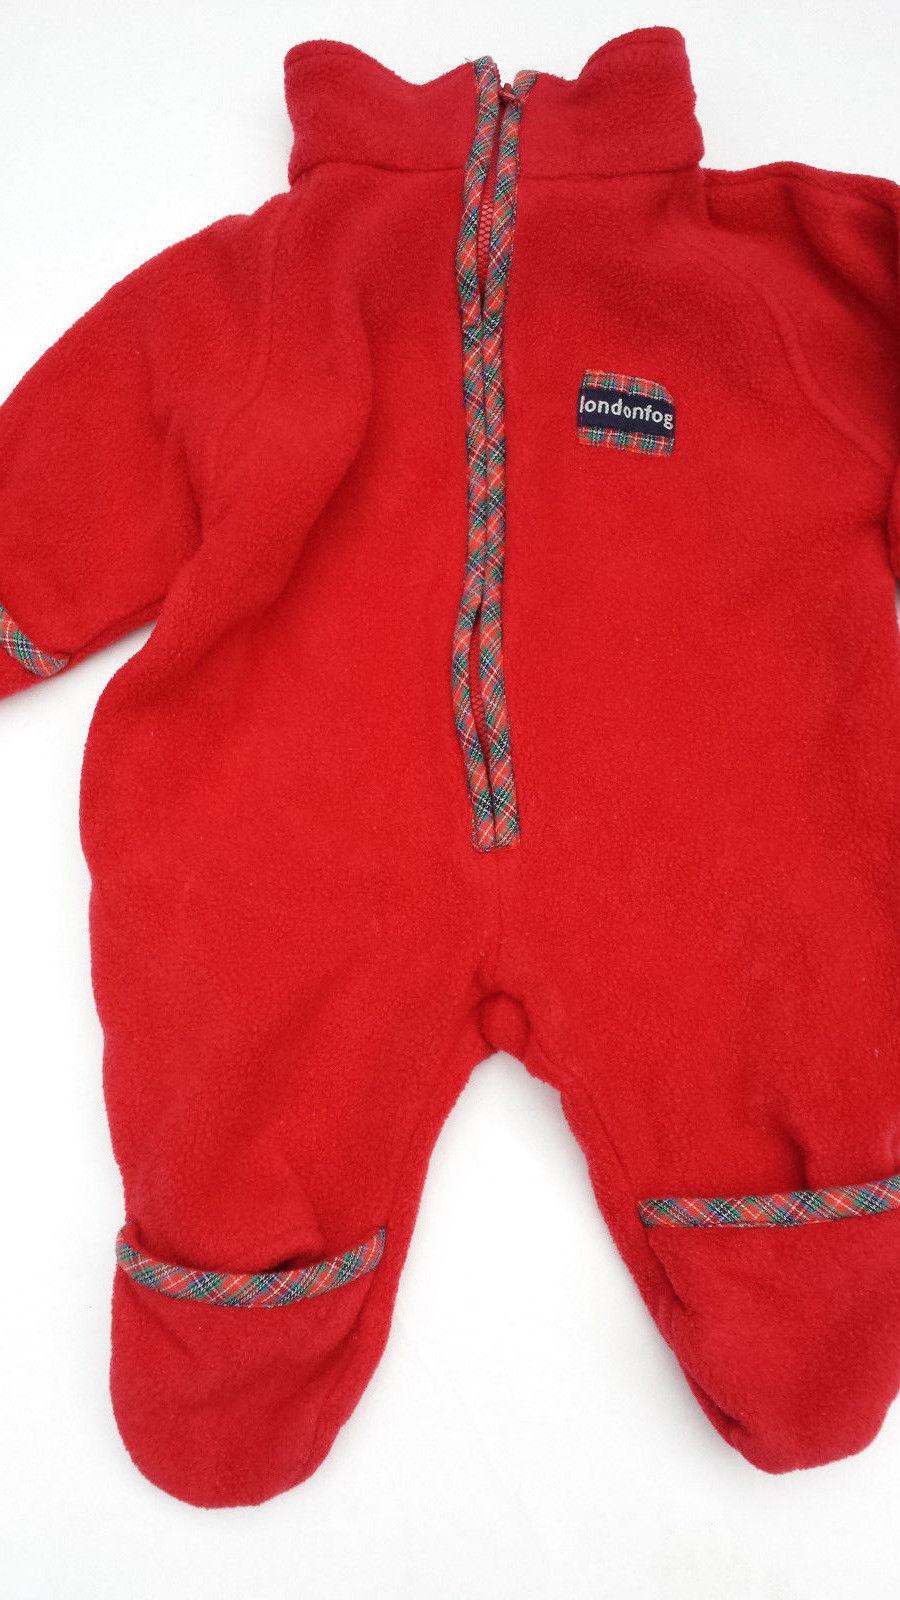 Unisex London Fog Red Infant Pram Bunting Snowsuit 3-6 months EUC